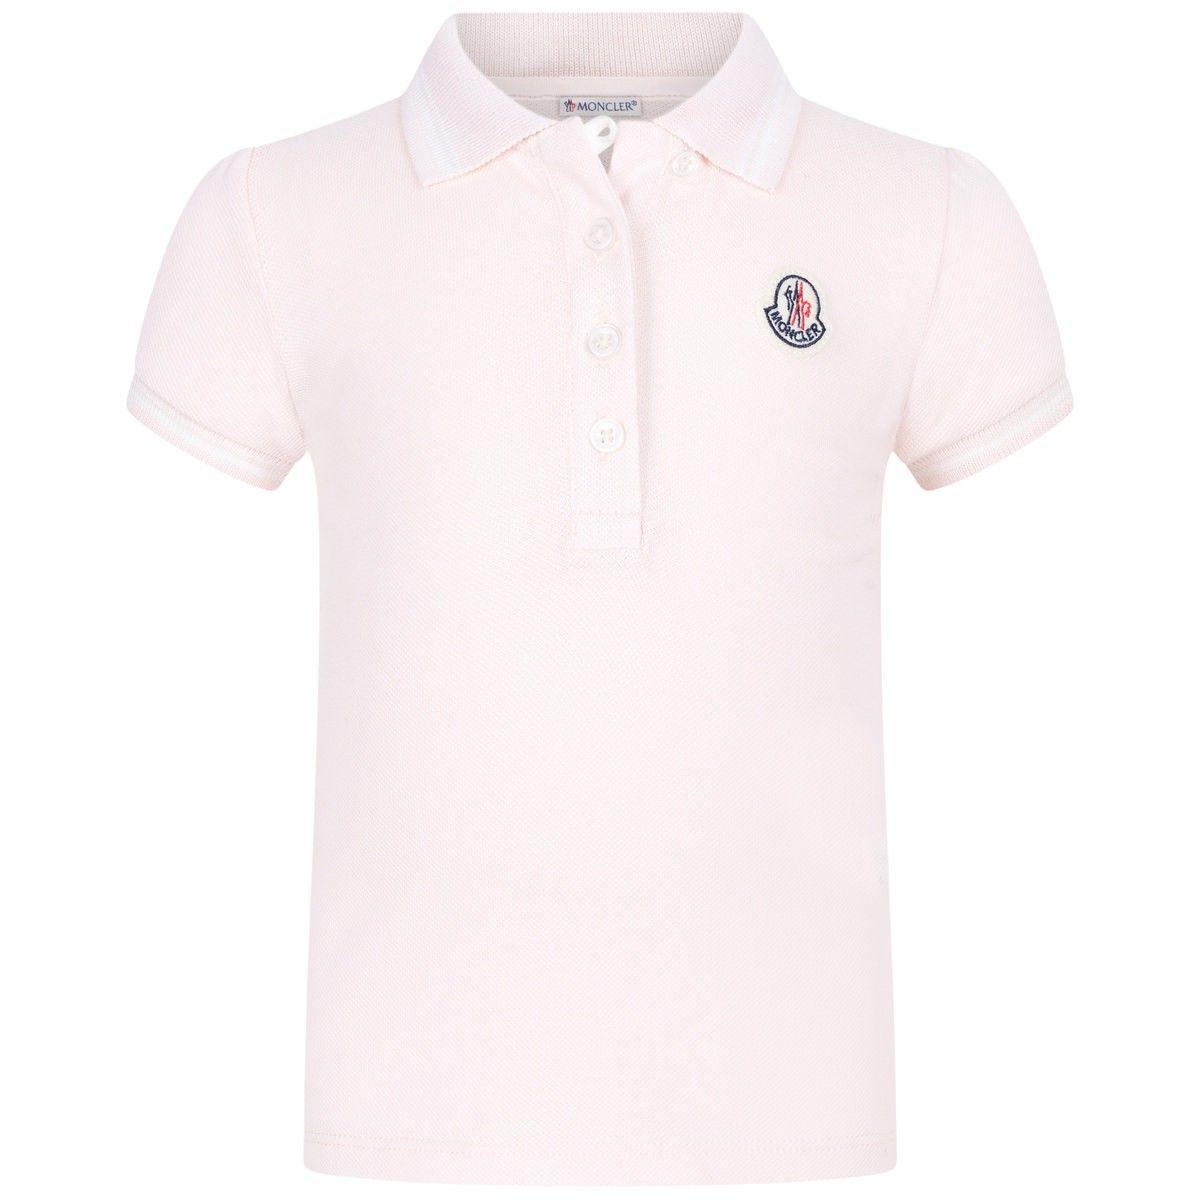 Moncler Baby Girls Pale Pink Polo Shirt Moncler Ss16 Moncler